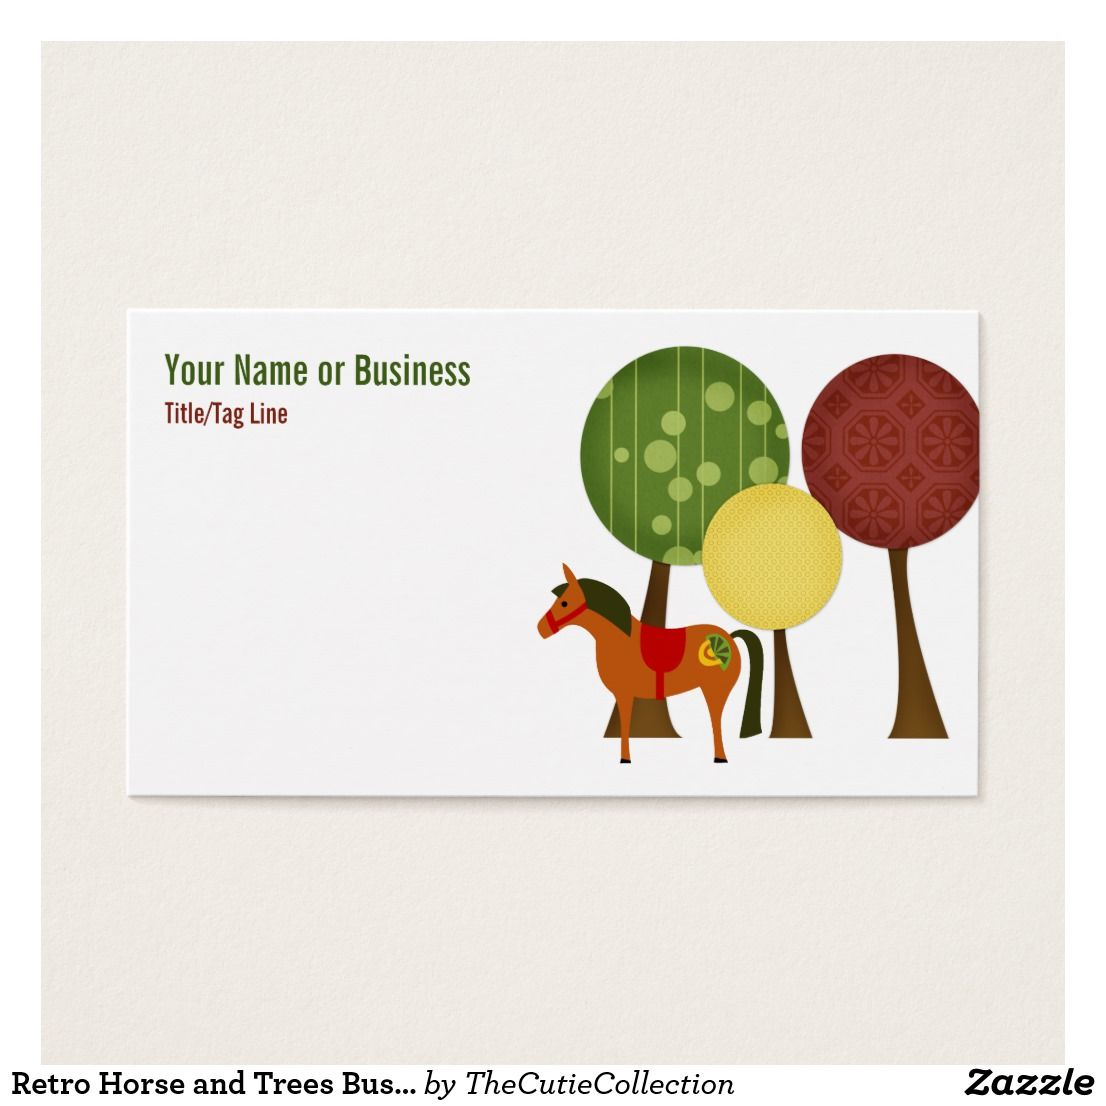 Retro horse and trees business card retro